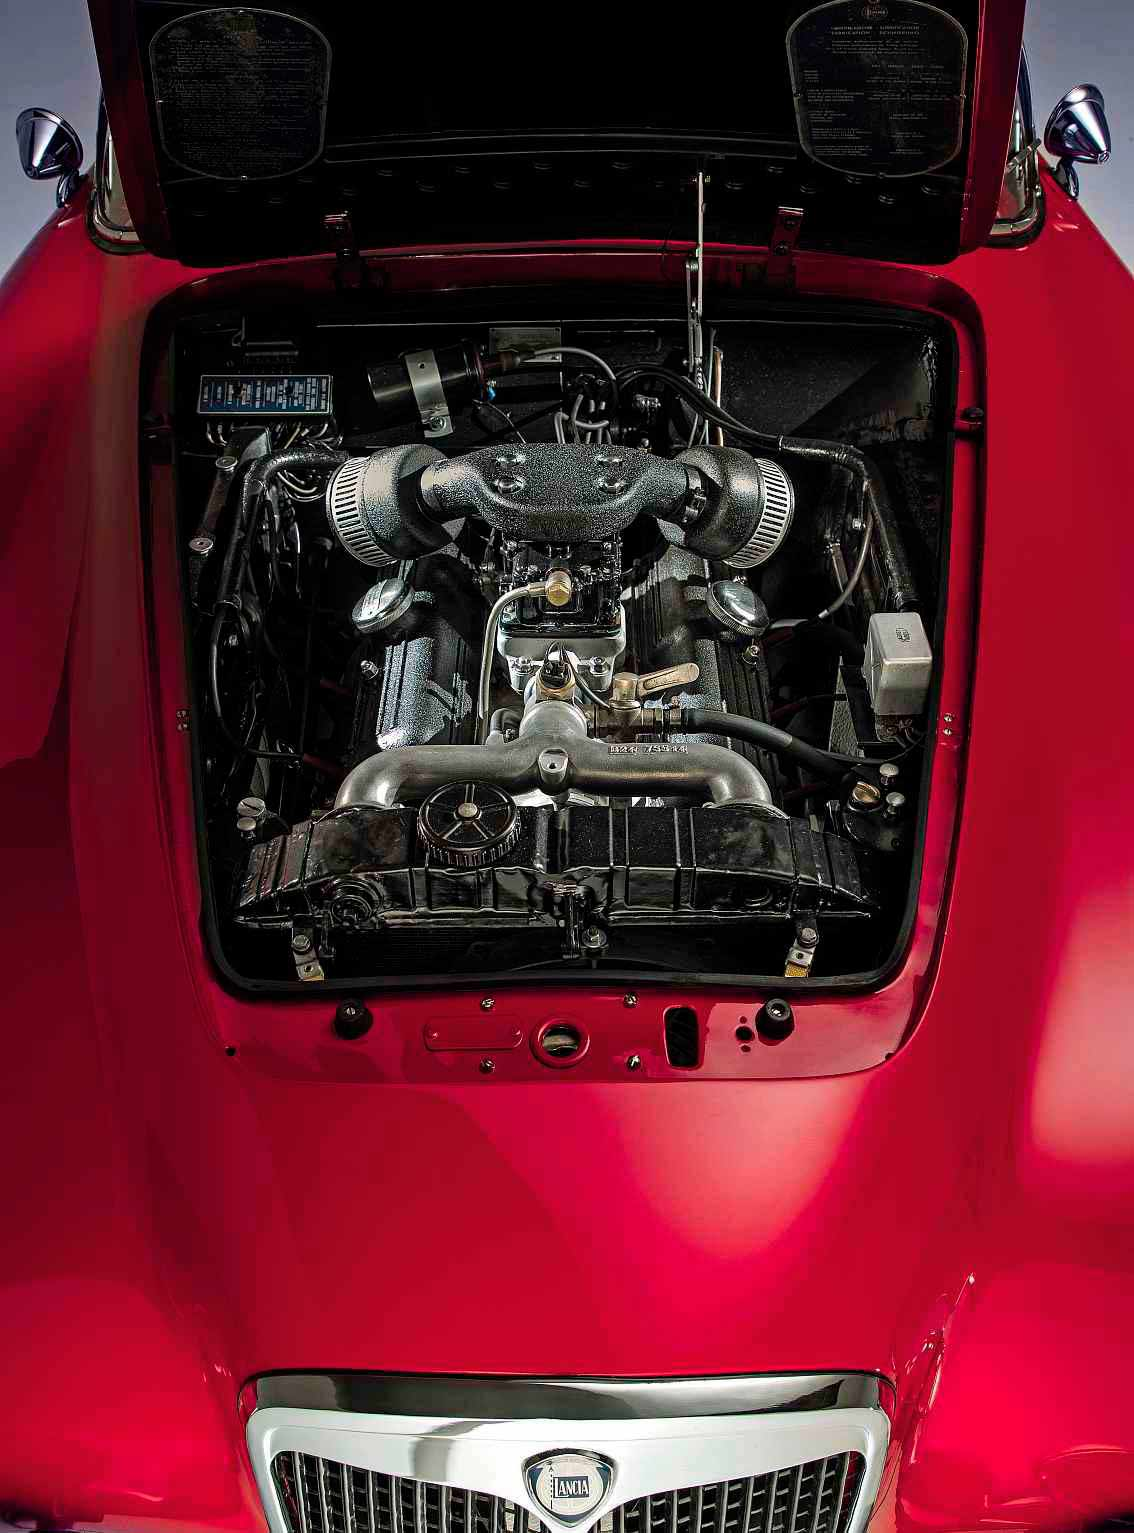 1955 Lancia Aurelia B24 America engine V6